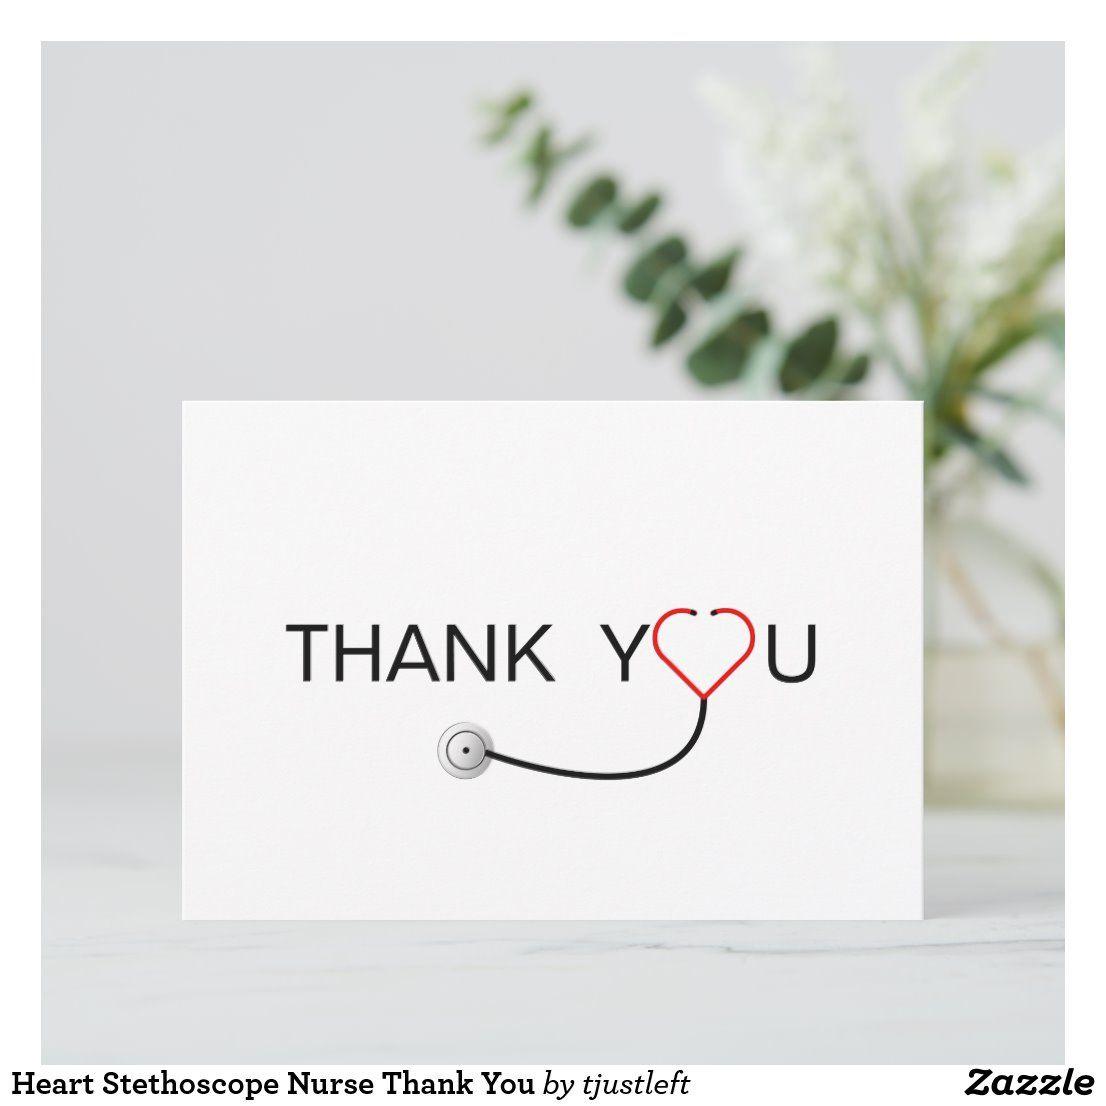 Heart Stethoscope Nurse Thank You Zazzle Com Writing Thank You Cards Cute Thank You Cards Nurses Week Quotes